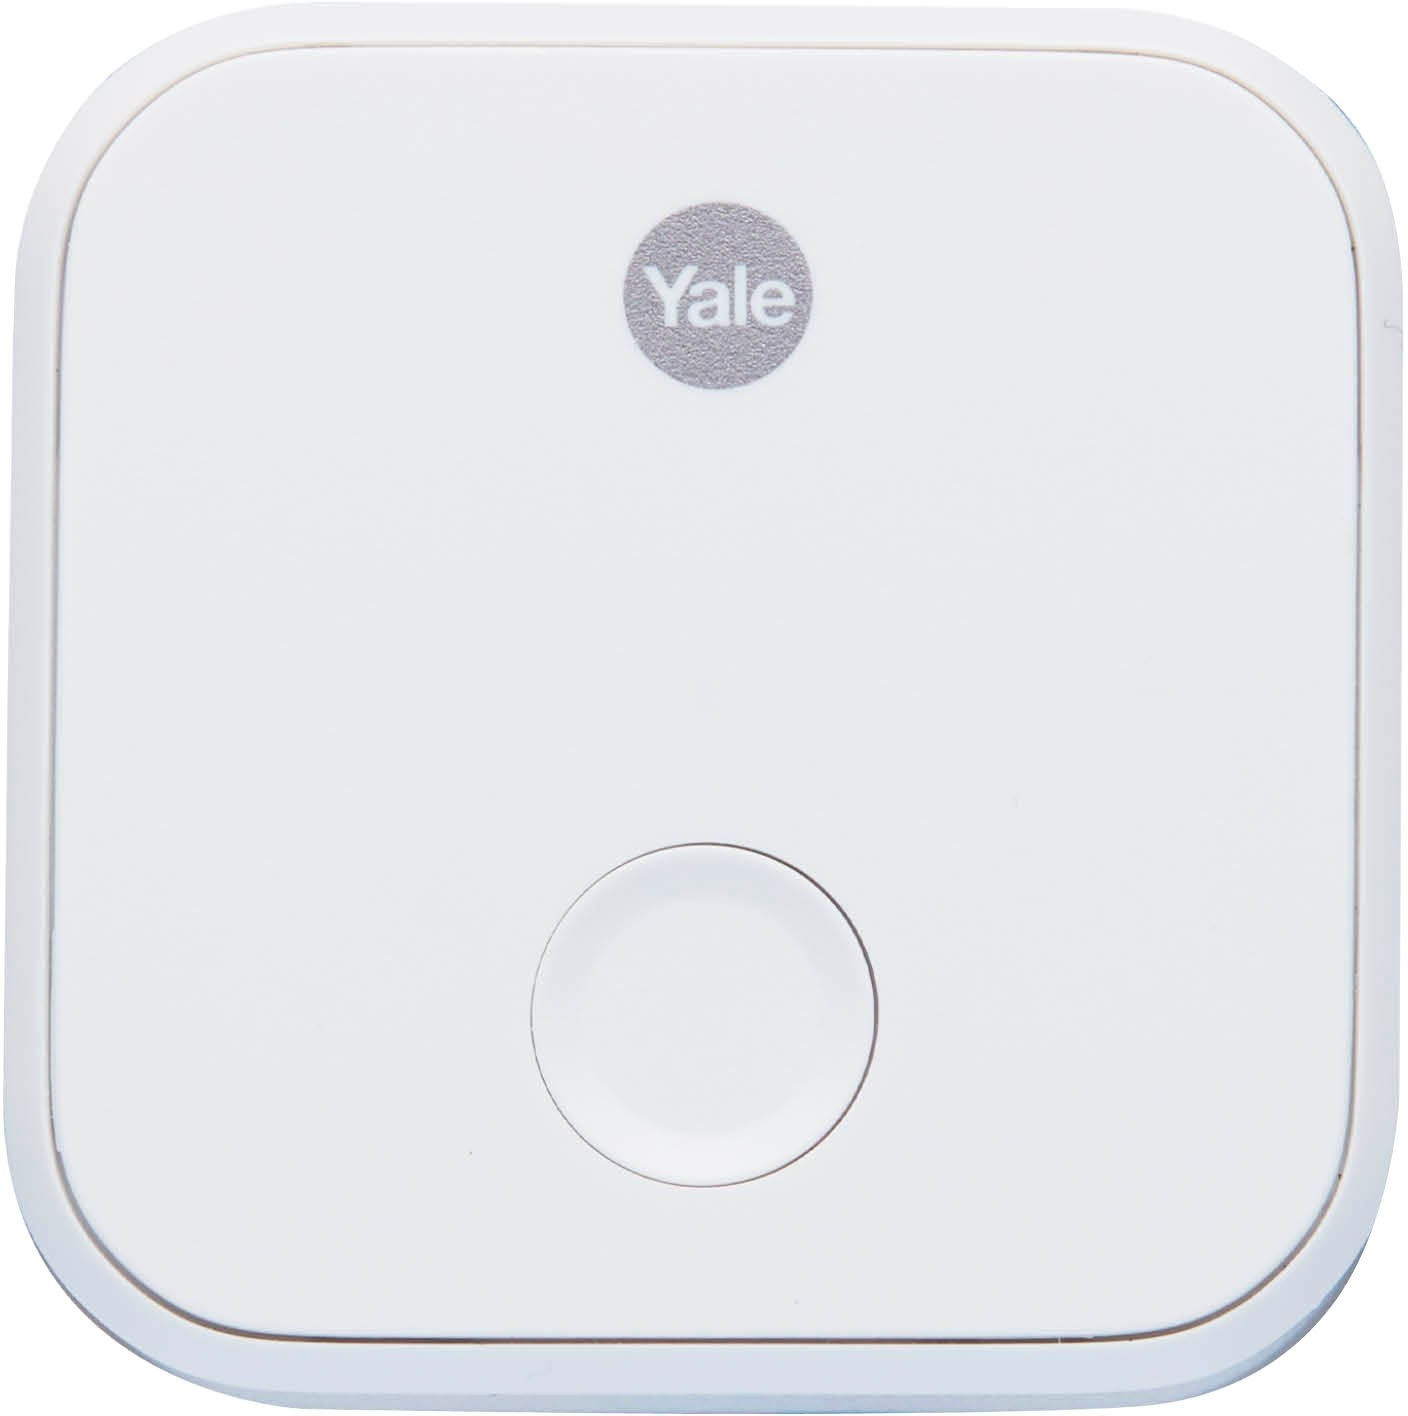 Yale Deurslotaandrijving Linus Connect deurslotaandrijving - gratis ruilen op otto.nl